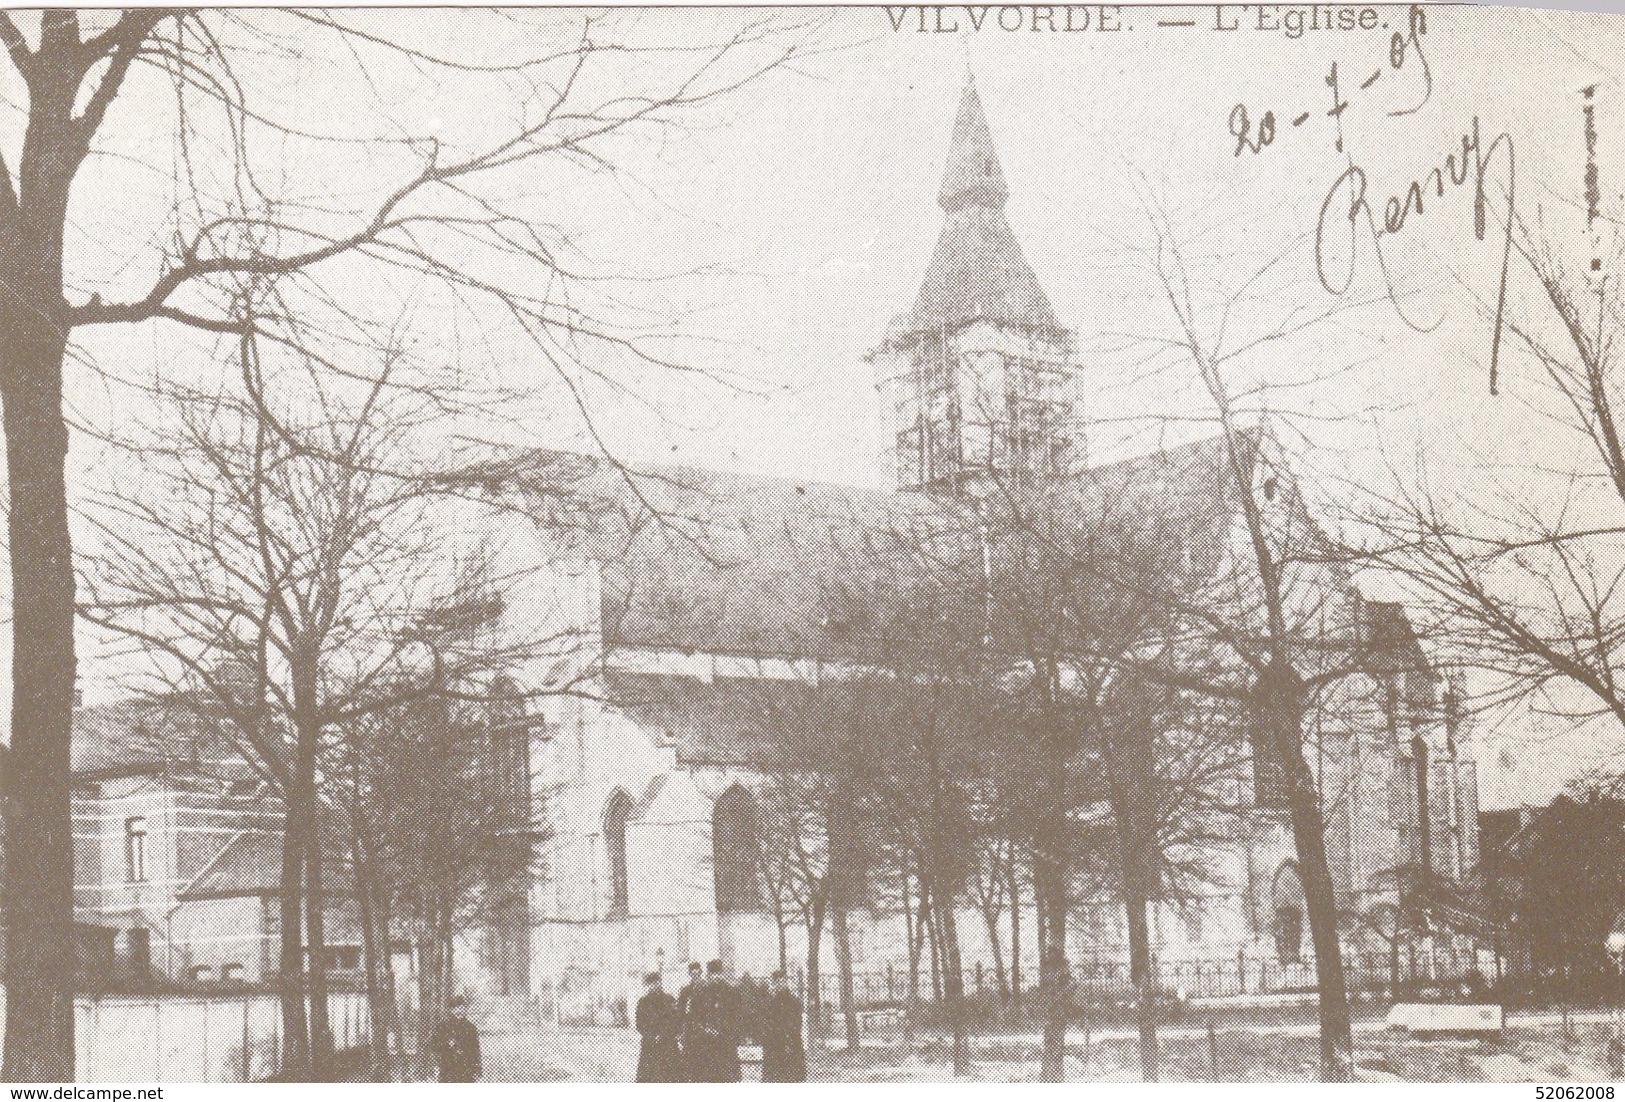 Vilvorde-L'Eglise - Vilvoorde